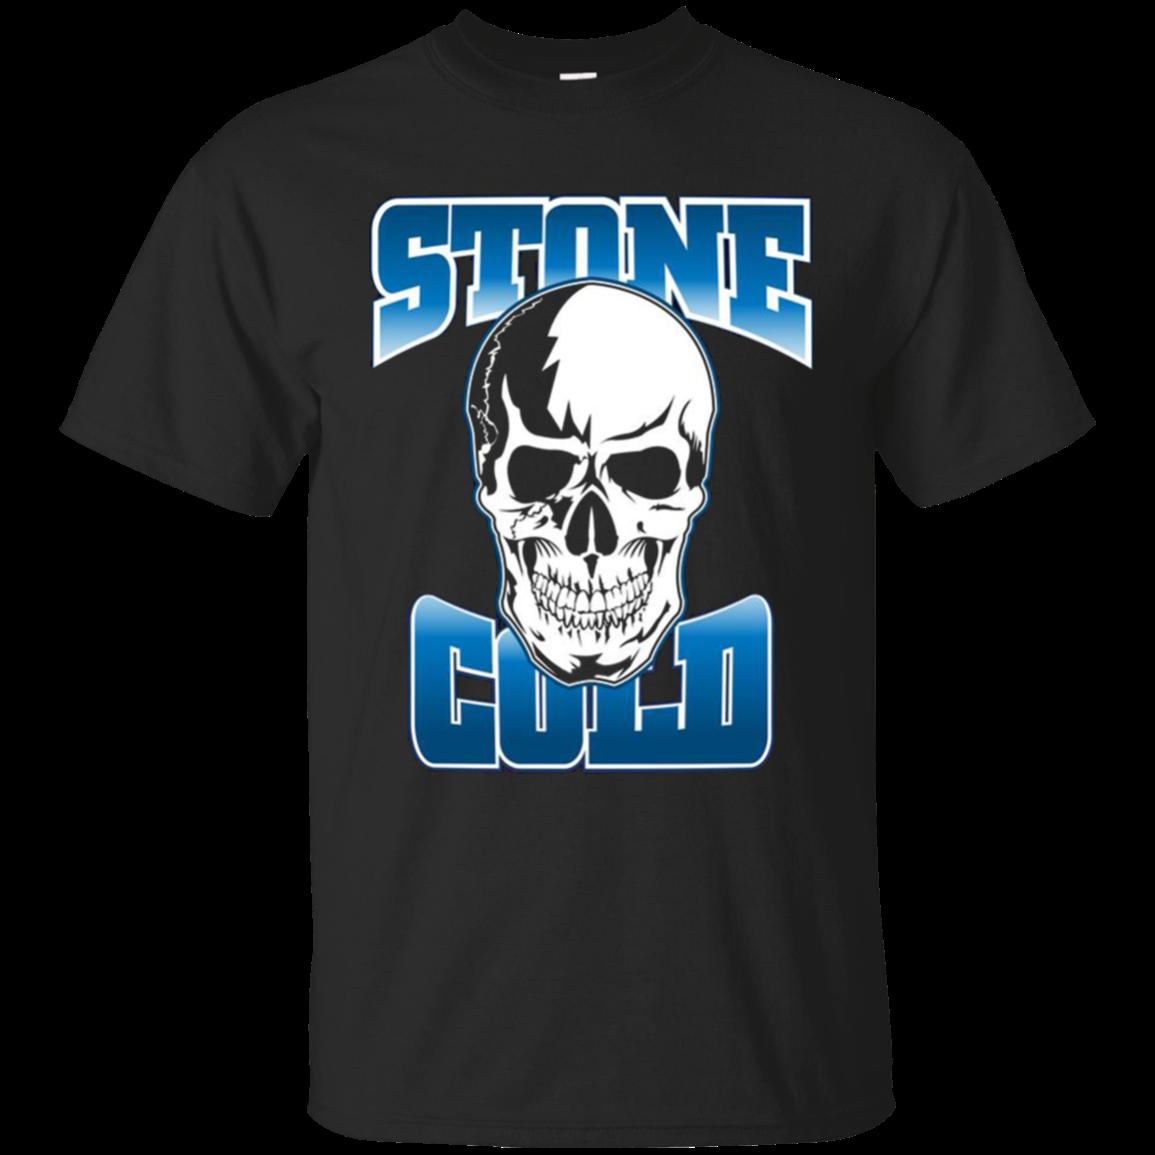 Stone Cold Steve Austin Shirt Black Shipping Worldwide Ninonine Austin Shirt Stone Cold Steve Steve Austin